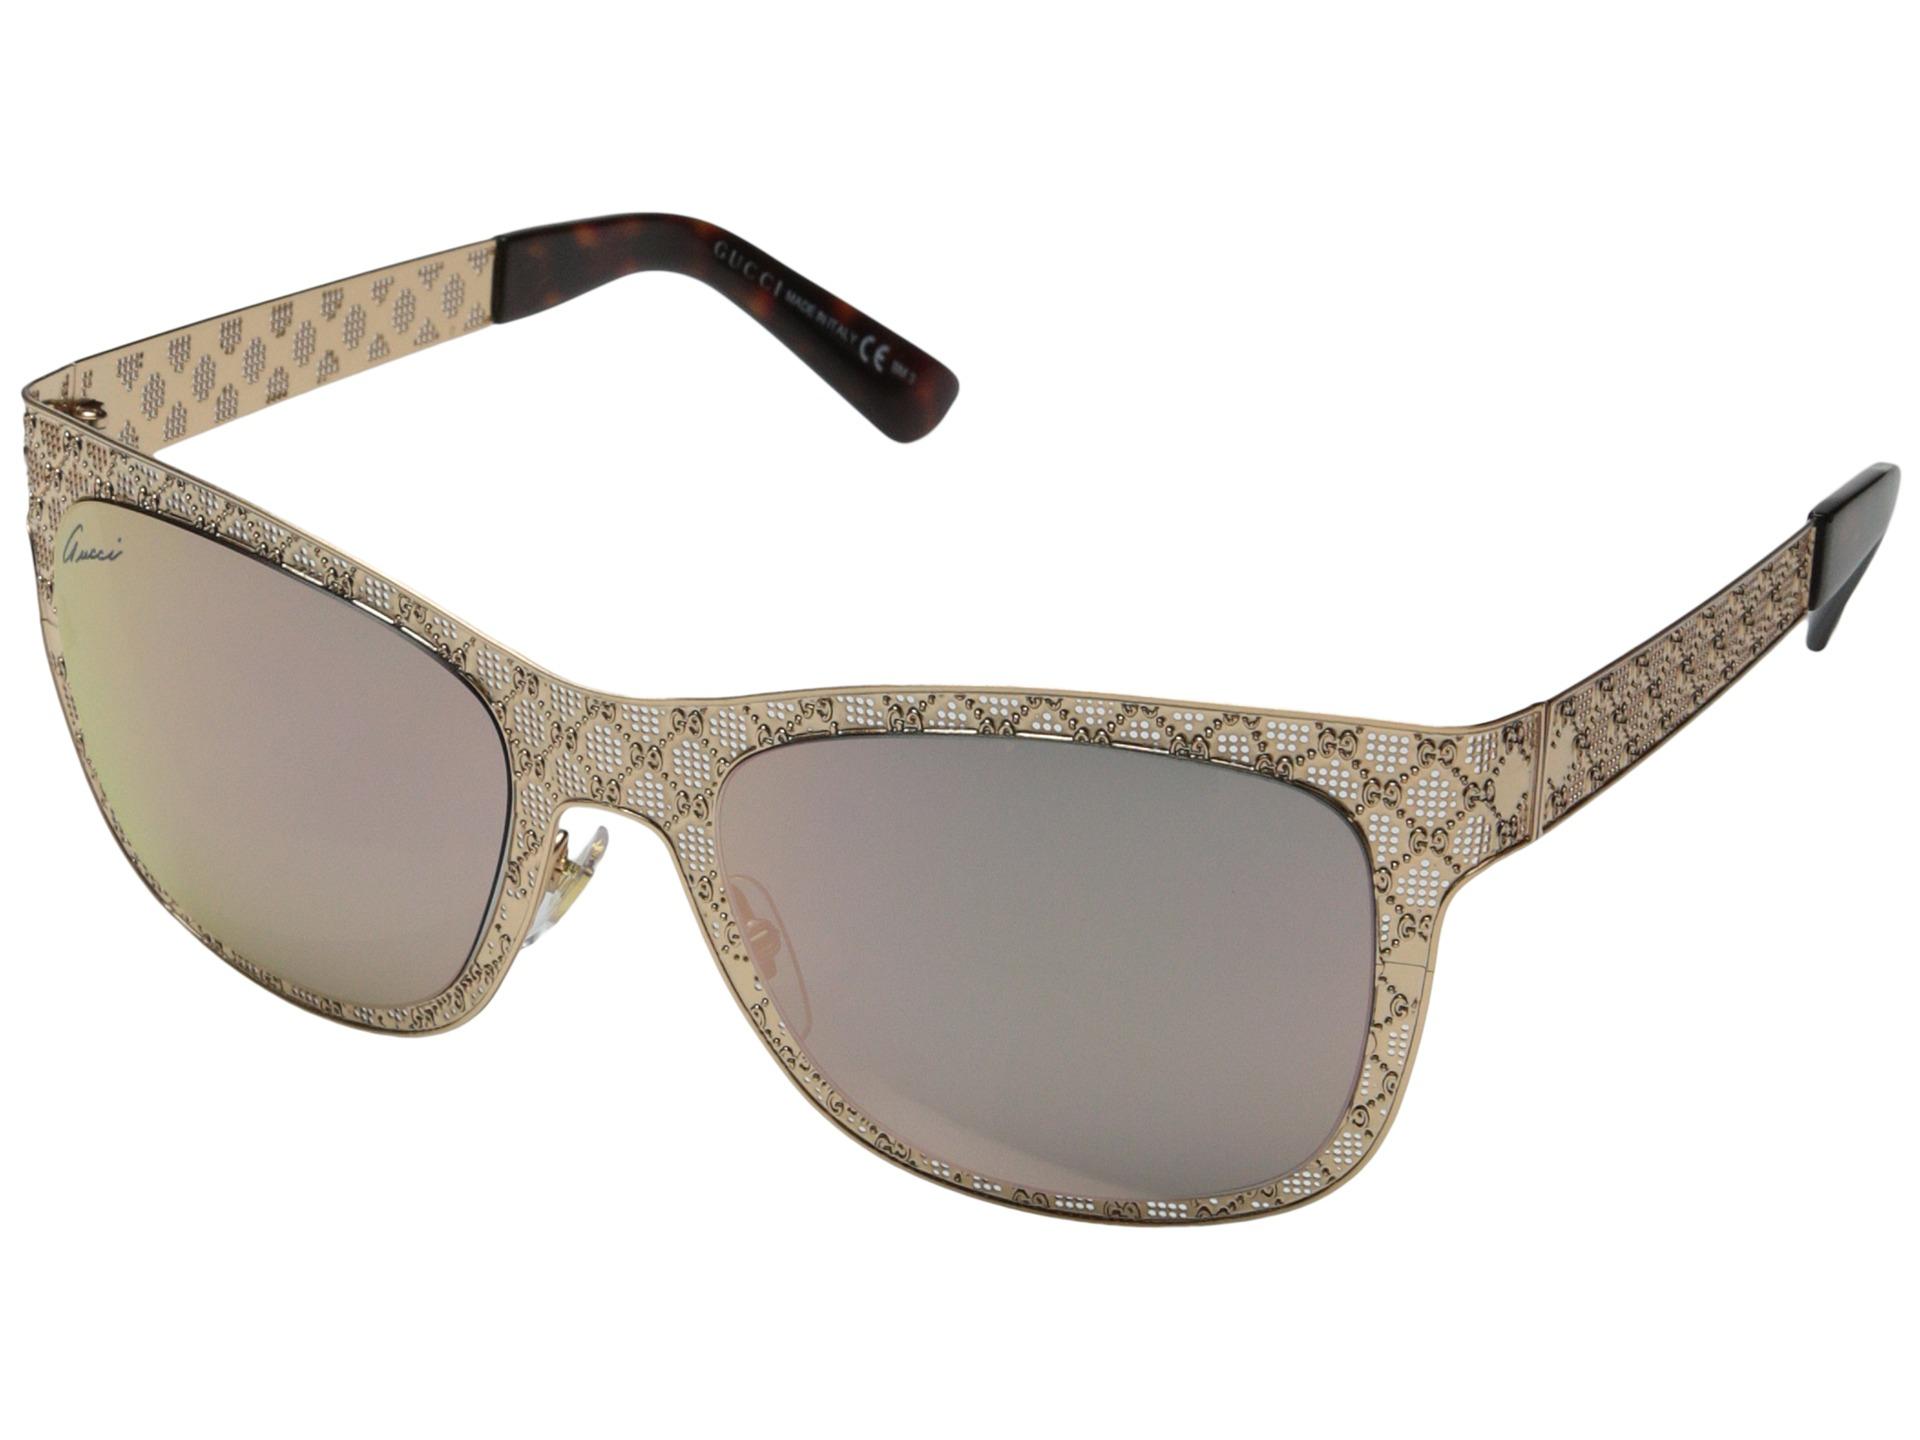 ca8cf898d32 Lyst - Gucci Men s Women s Unisex Aviator Sunglasses 1287 s Silver ...